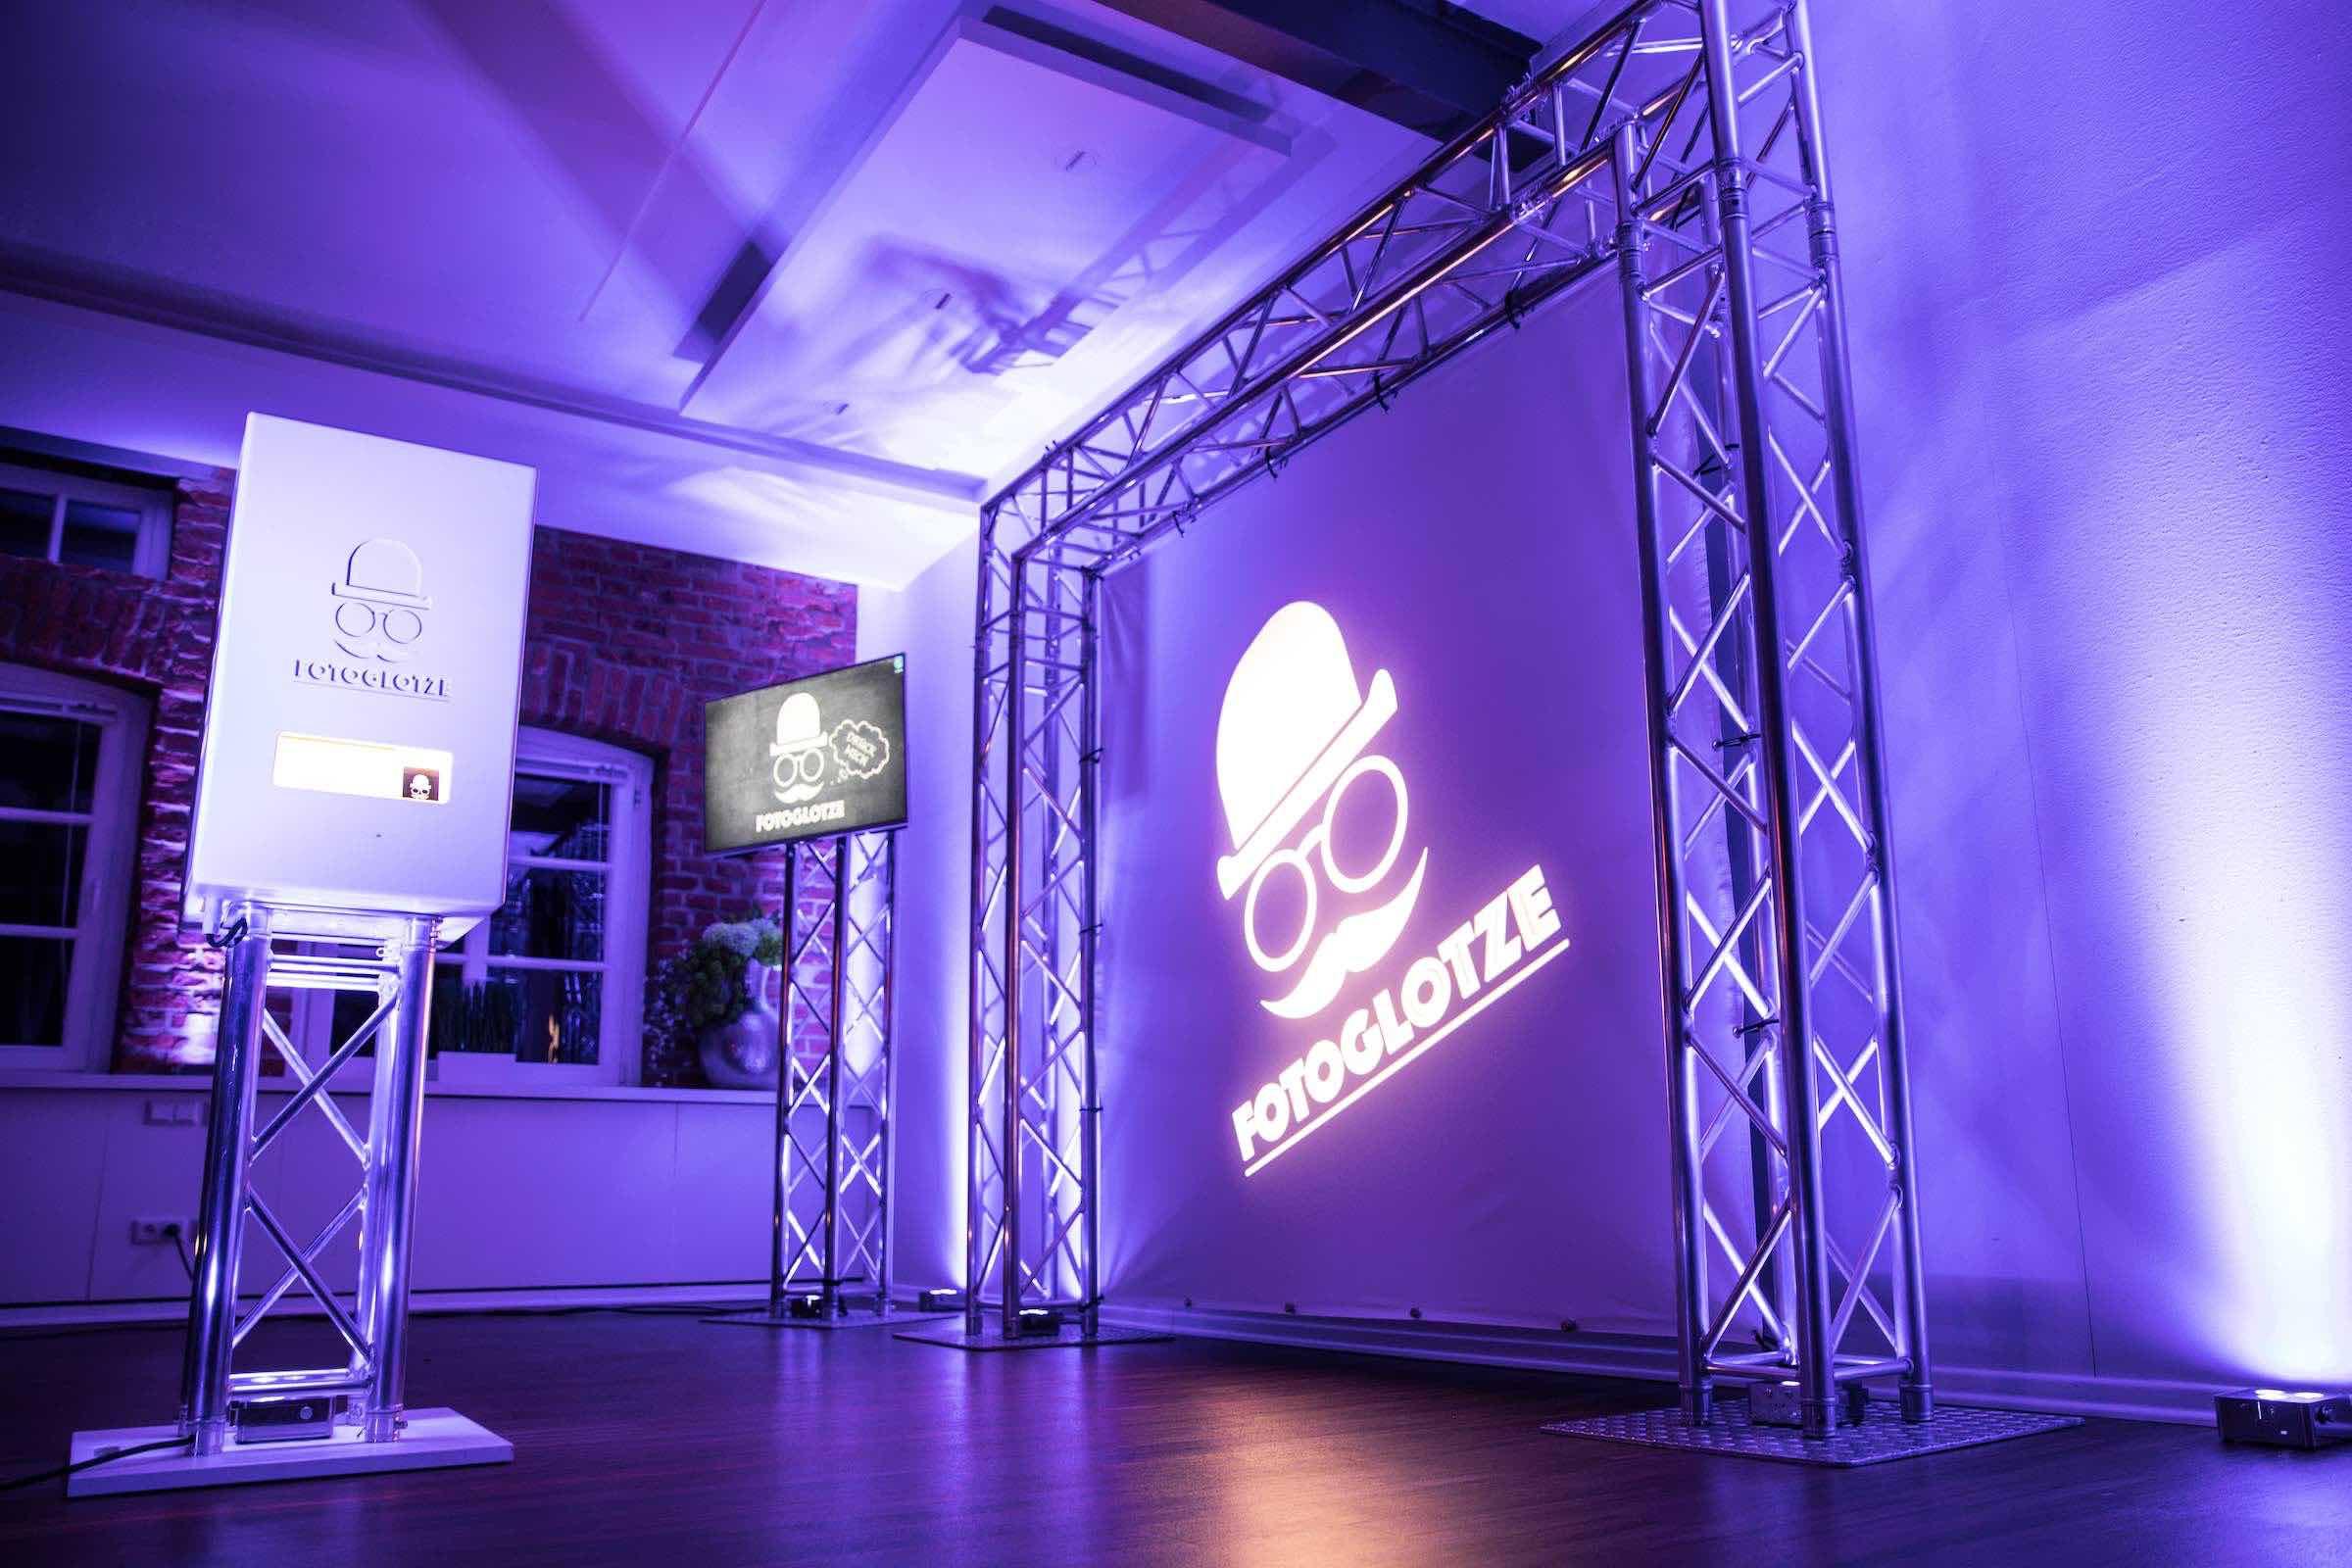 Fotobox | Hamburg | Druck | Ausdruck | Sofortdruck | Fotokiste | Photobooth | Hochzeit | Messe | Event | Firmenfeier | Abiball | Verkleidung | Requisiten | Hannover | Buchen | Anfragen | Mieten | Hamburgfeiert